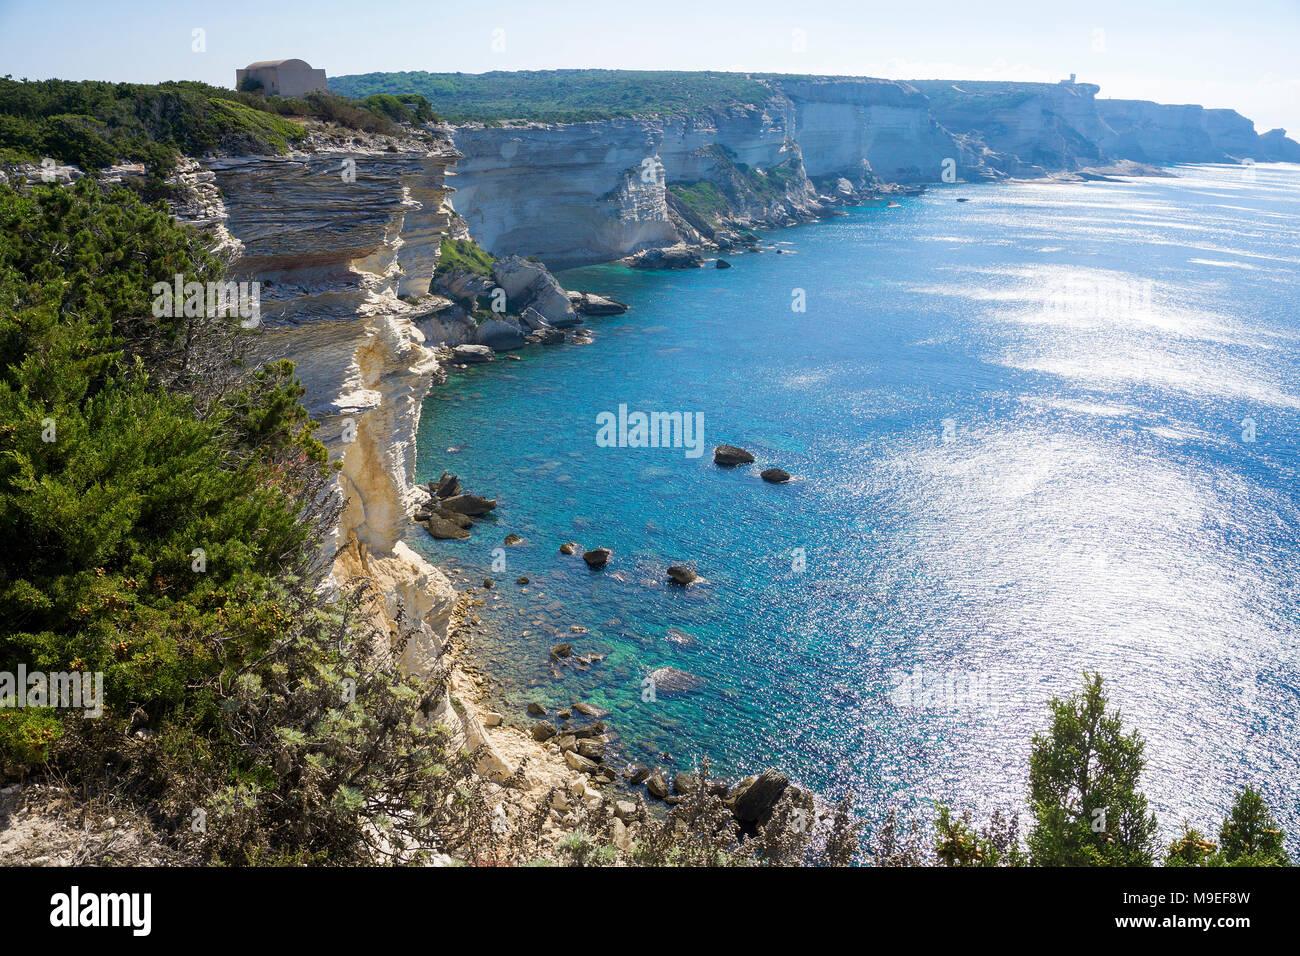 The chalkstone cliff at Bonifacio, Corsica, France, Mediterranean, Europe - Stock Image